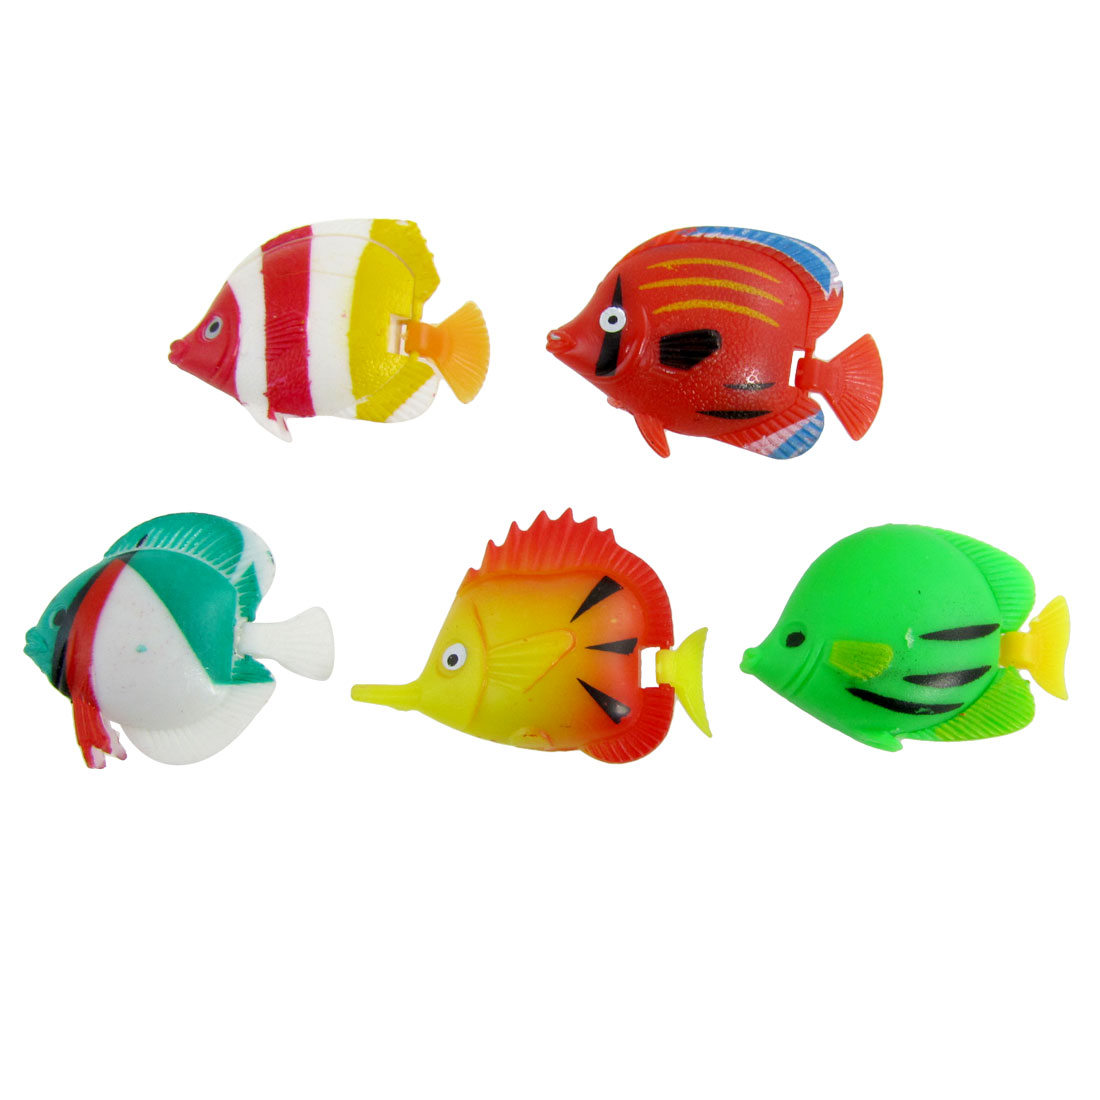 5 Pcs Colored Plastic Swing Tail Tropical Fish Tank Aquarium Ornament Decor